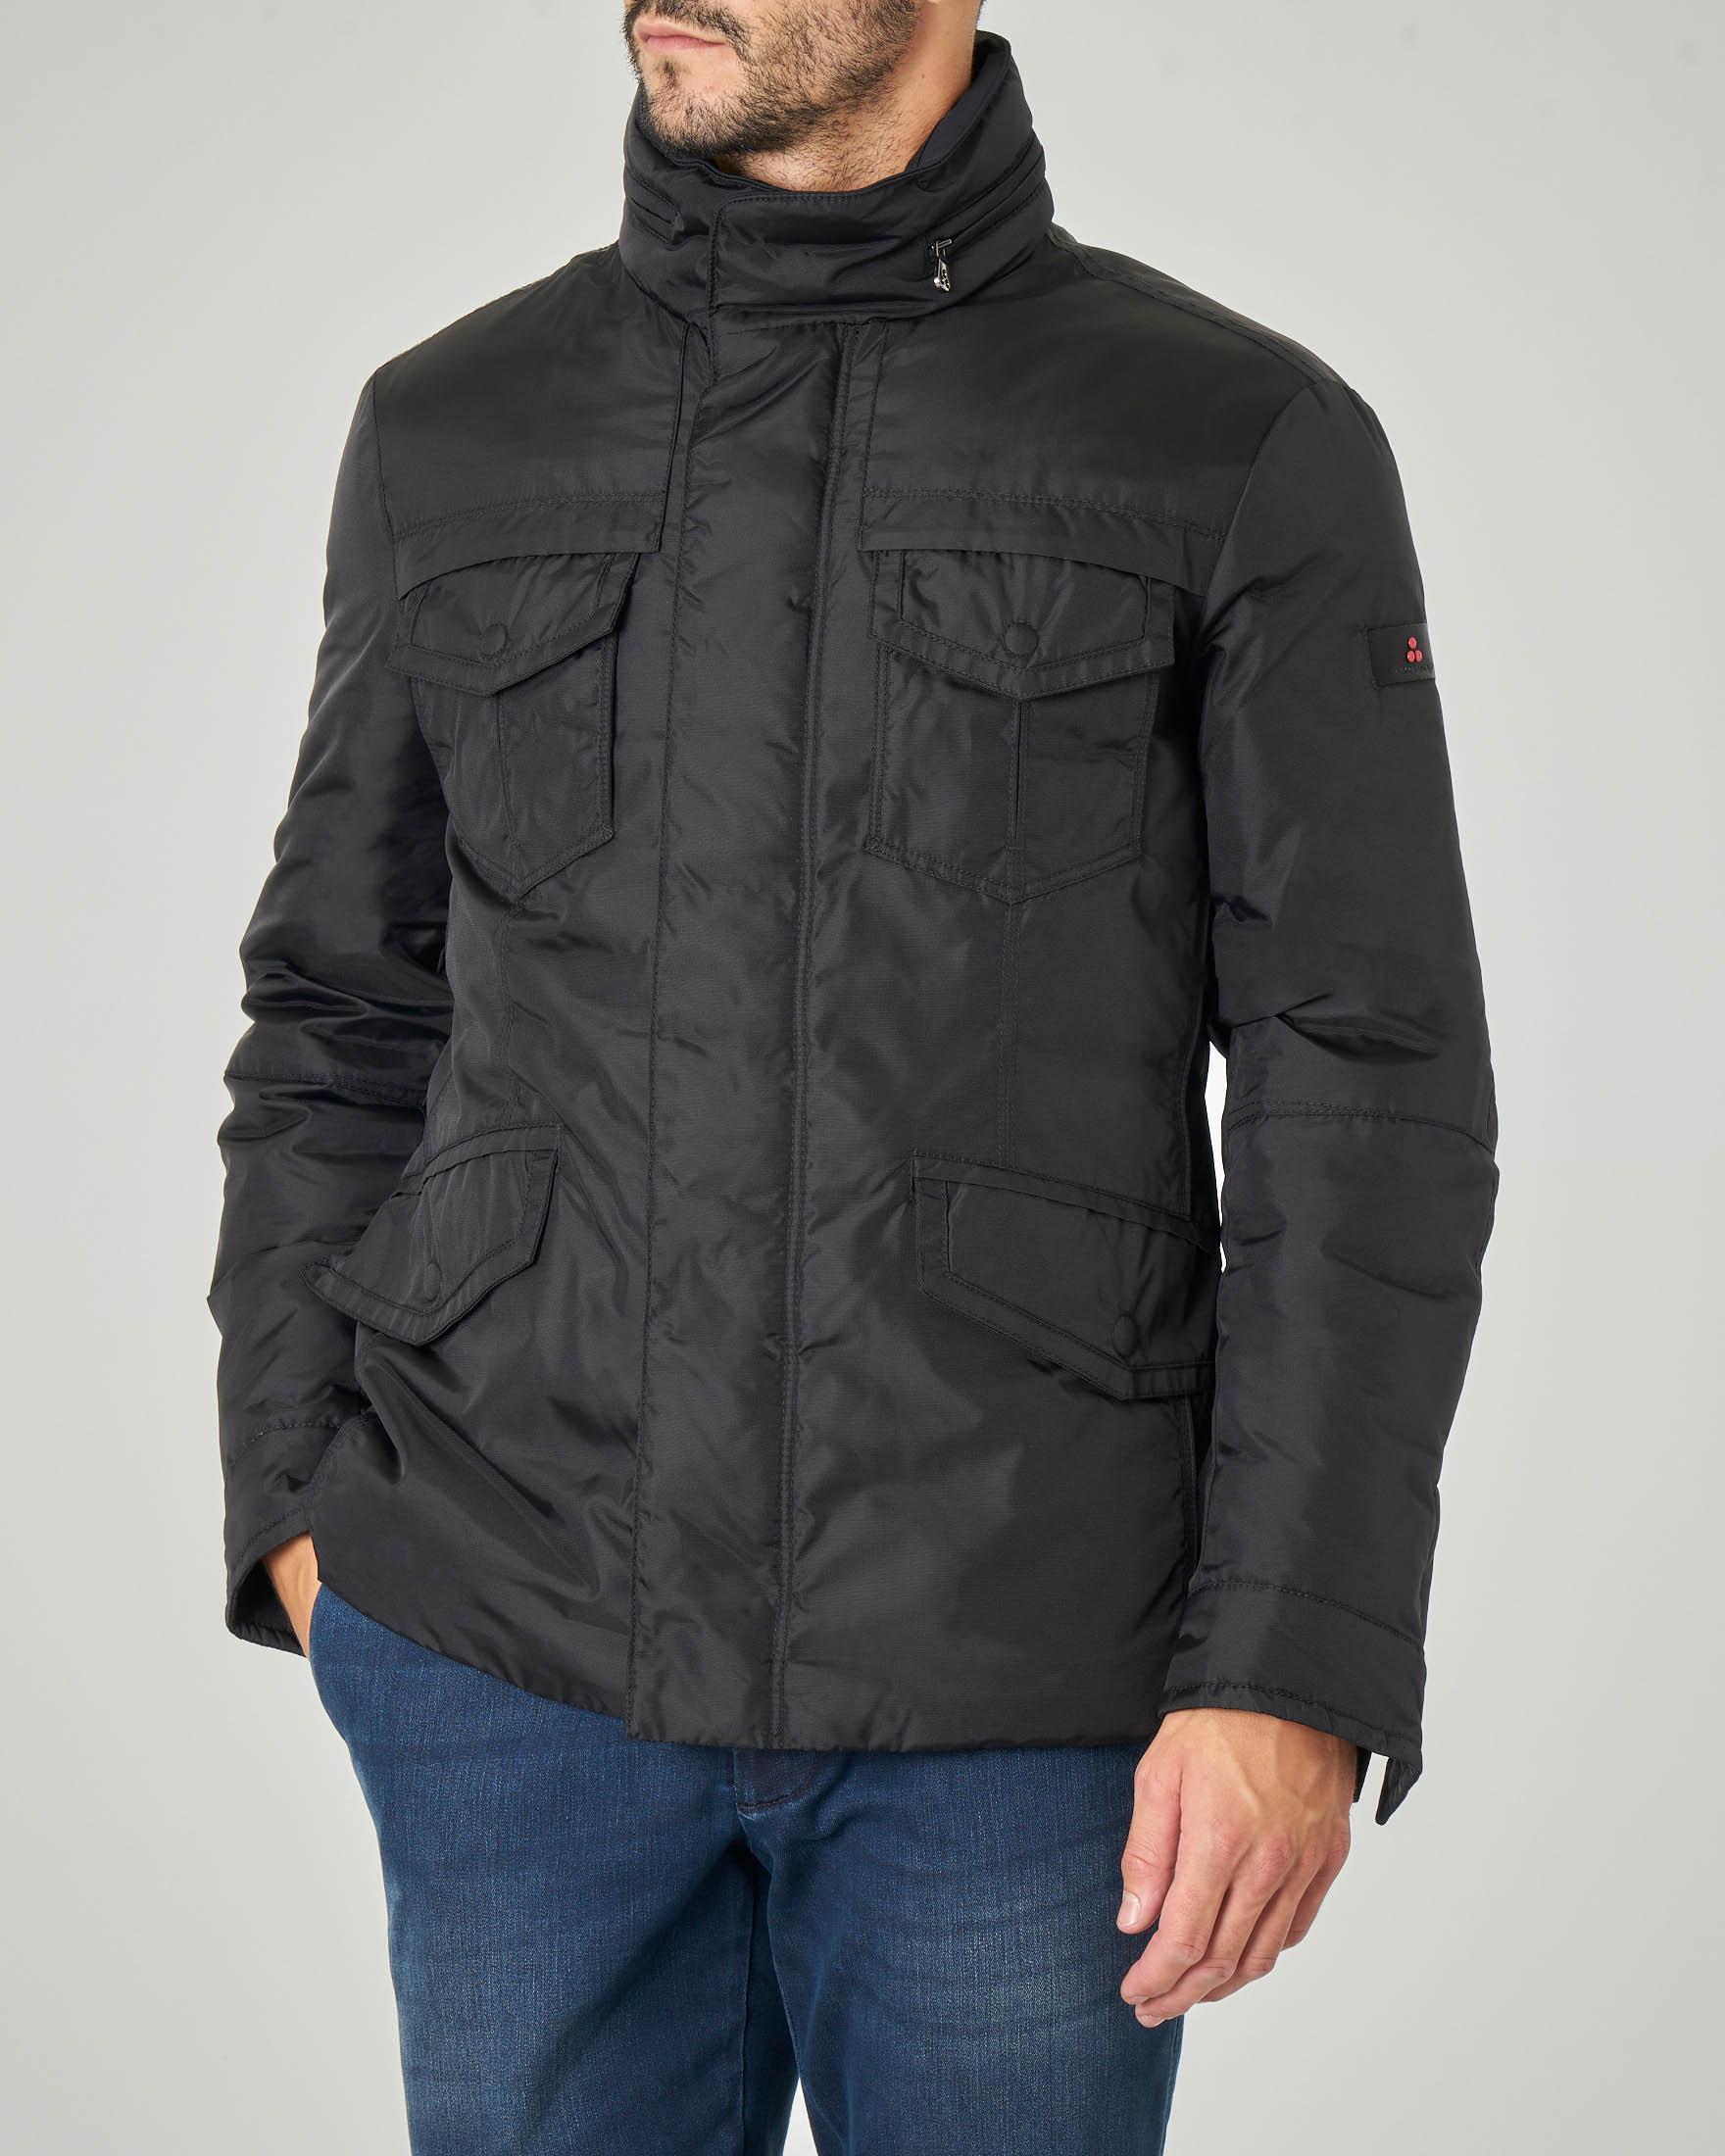 Field Jacket Stripes nera in tessuto oxford tecnico